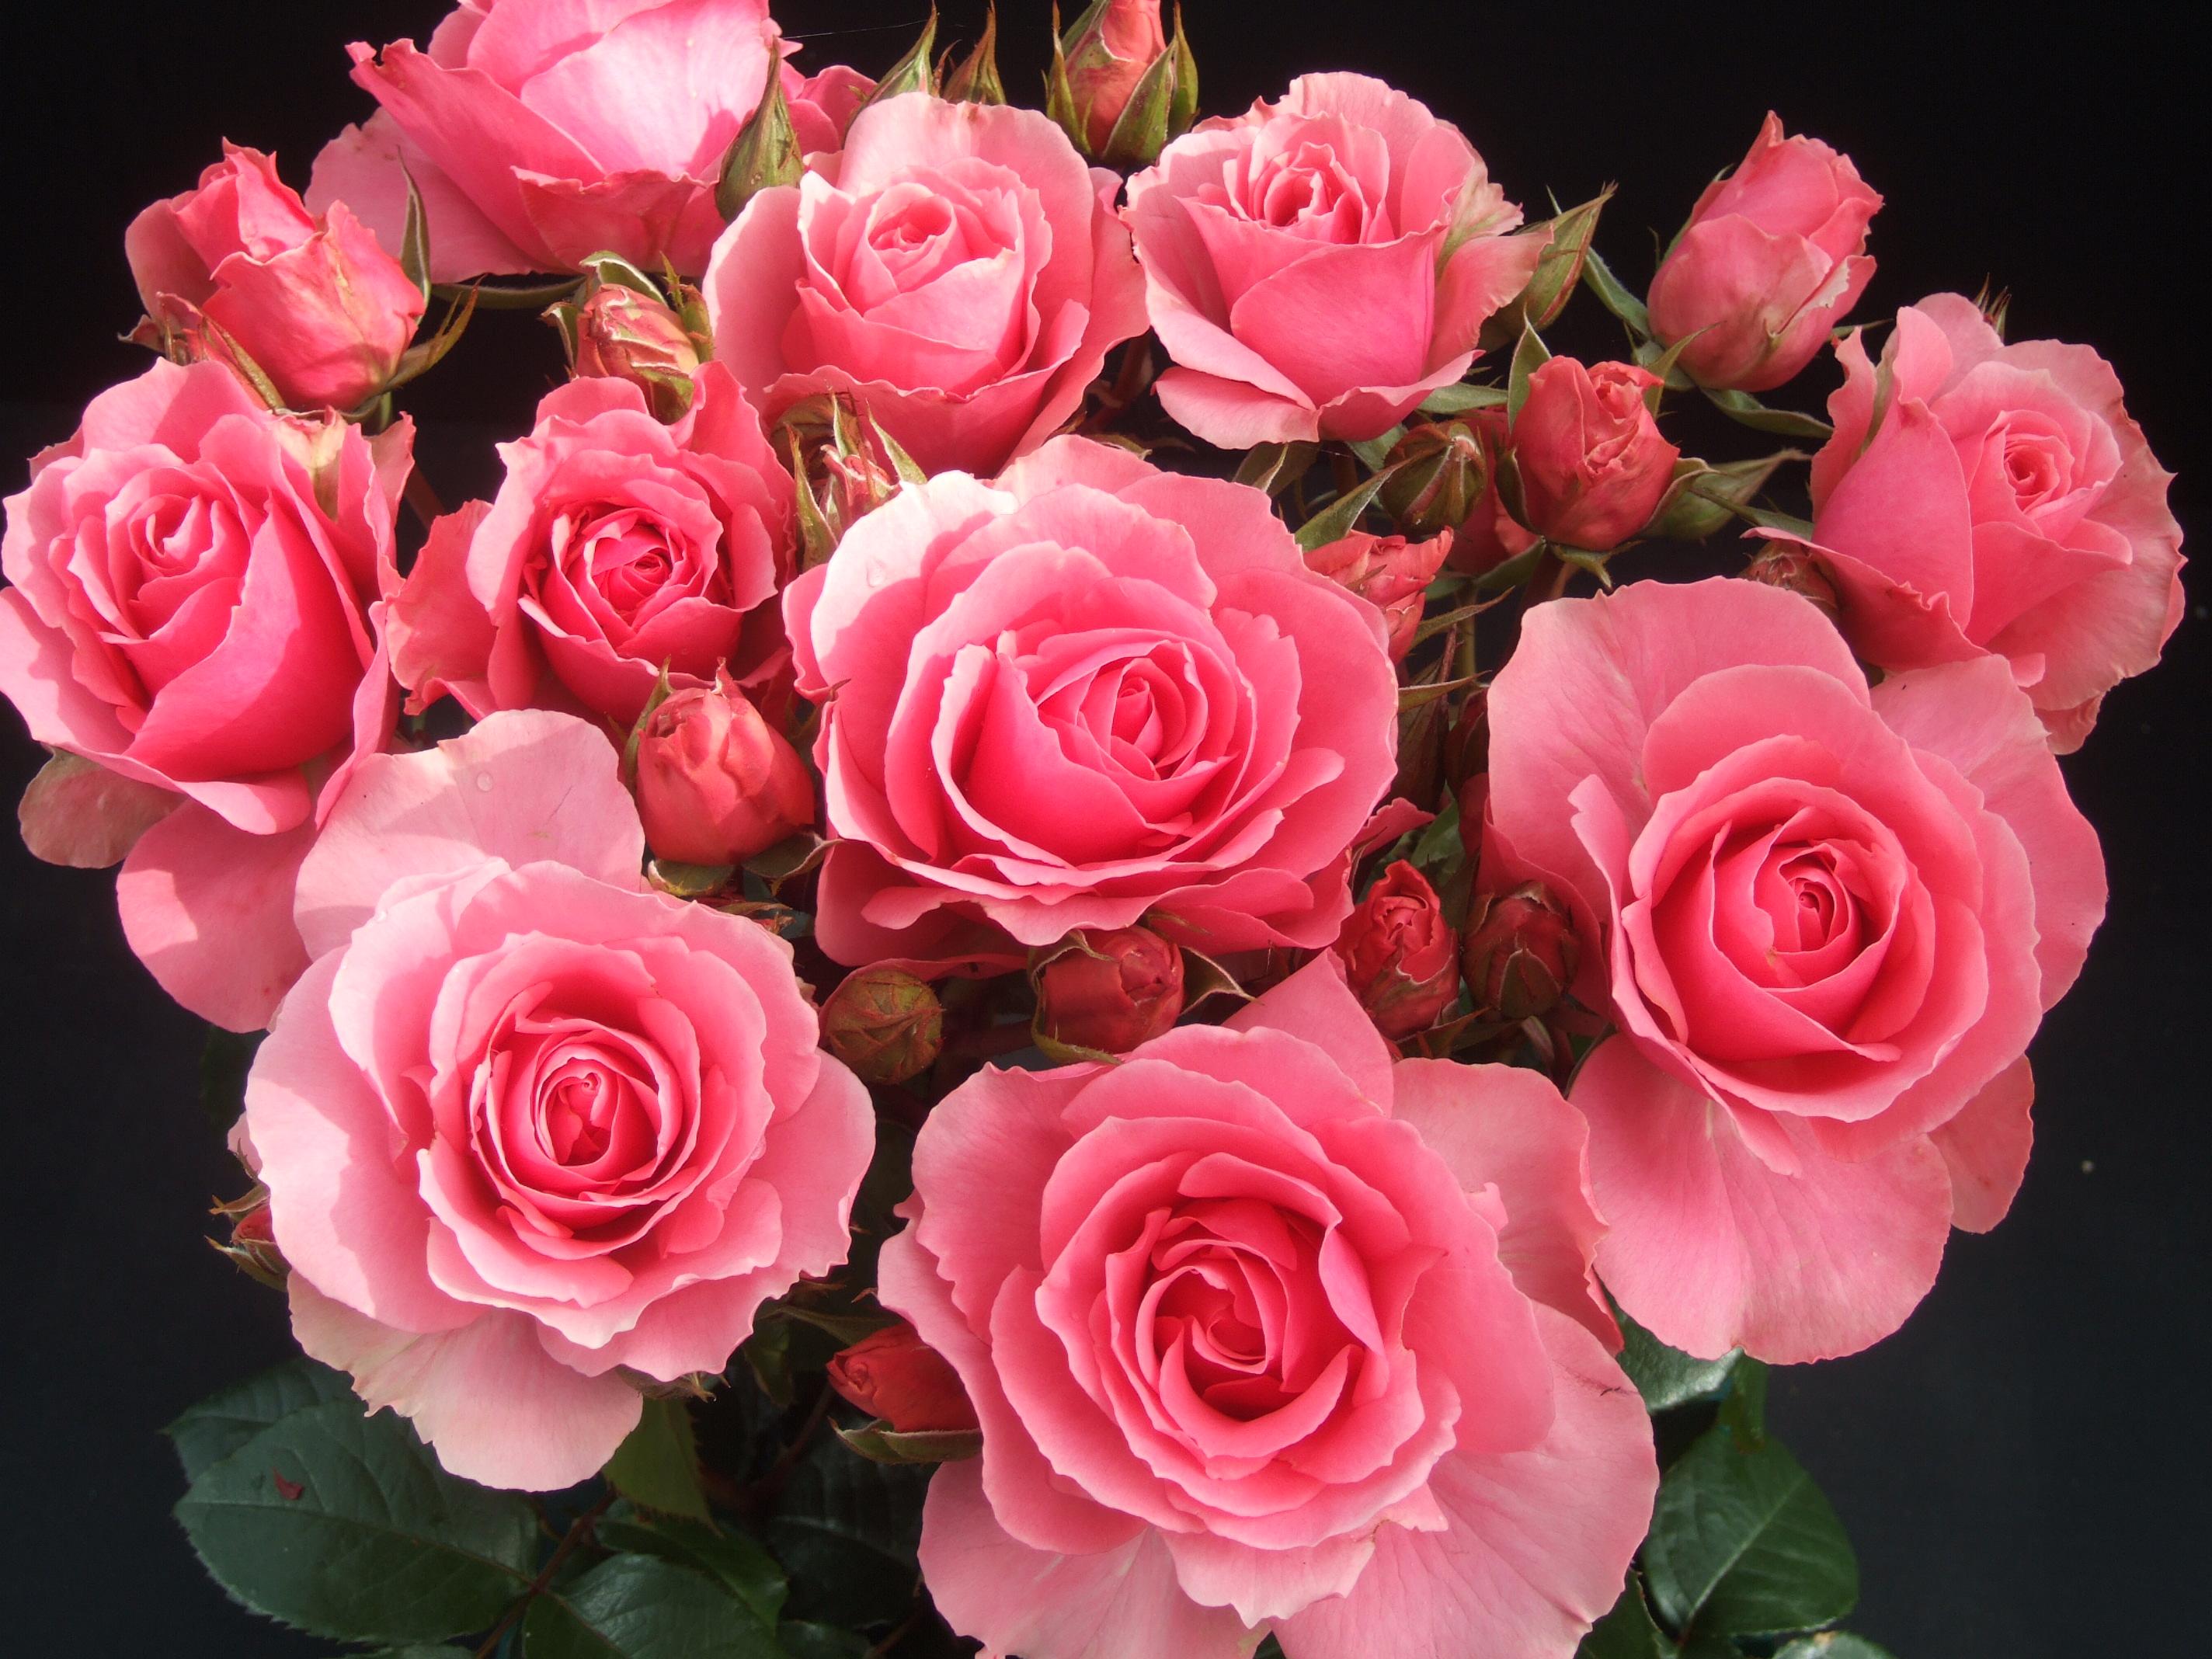 rose - roses Photo Roses